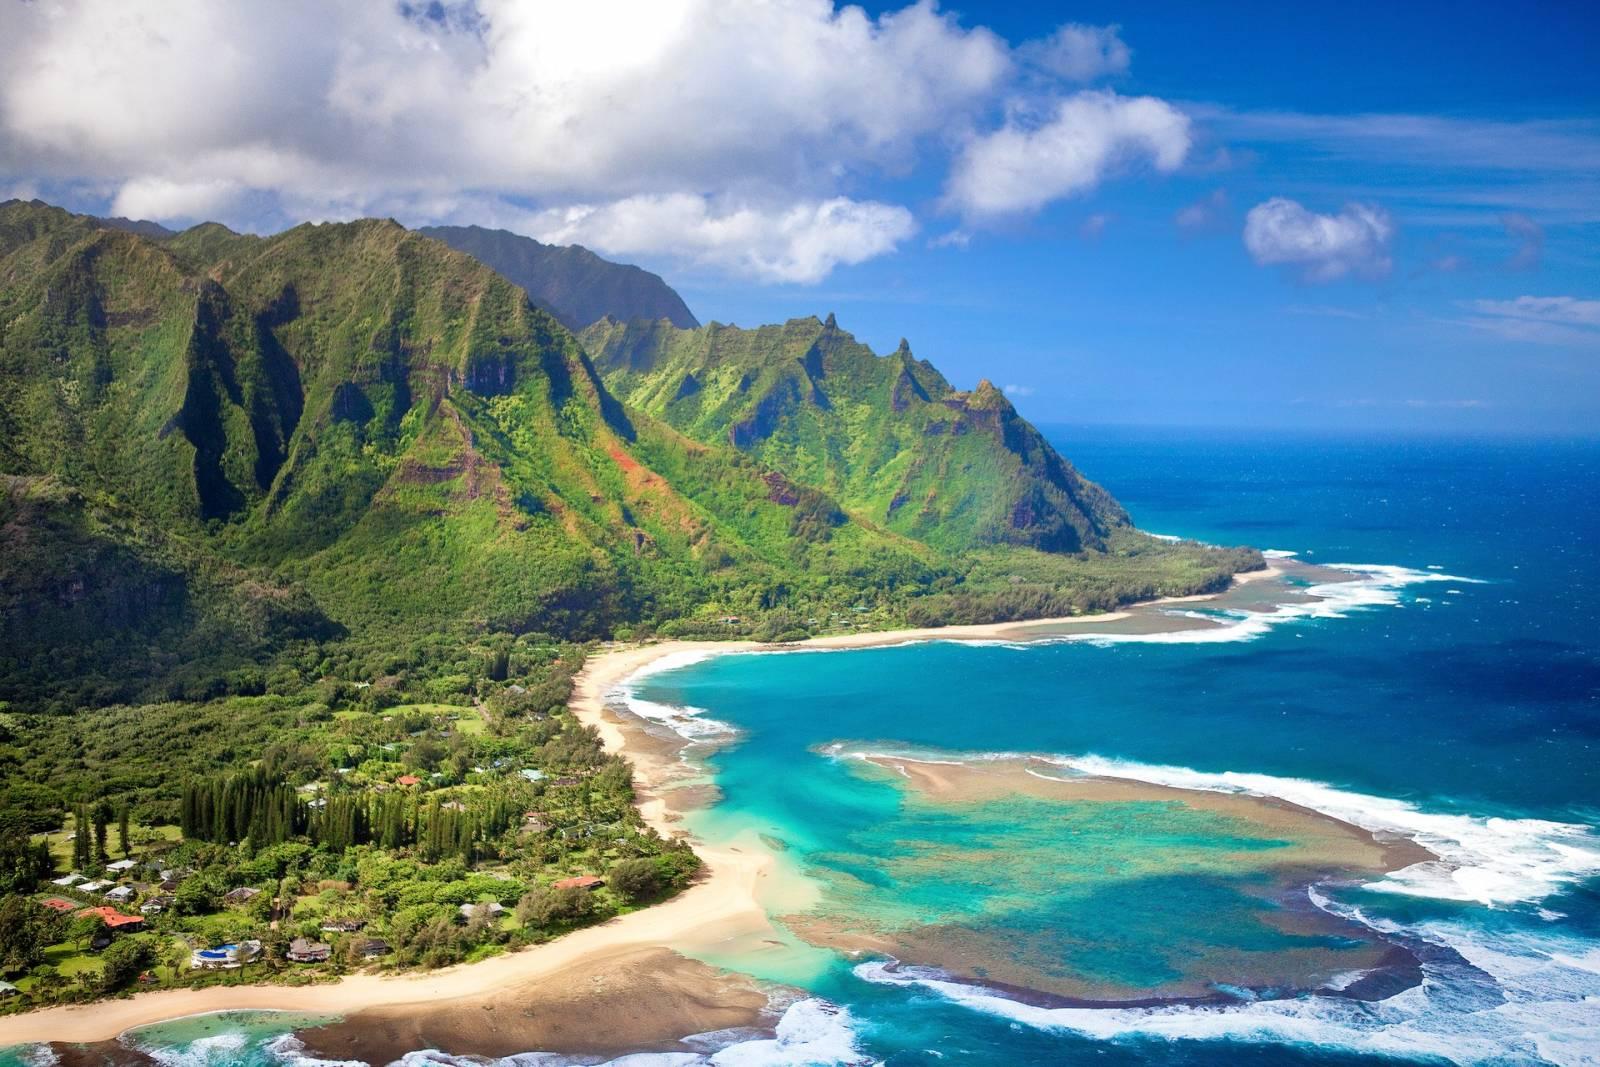 Moving to Kauai - My Personal Experience - Hawaii Real ...